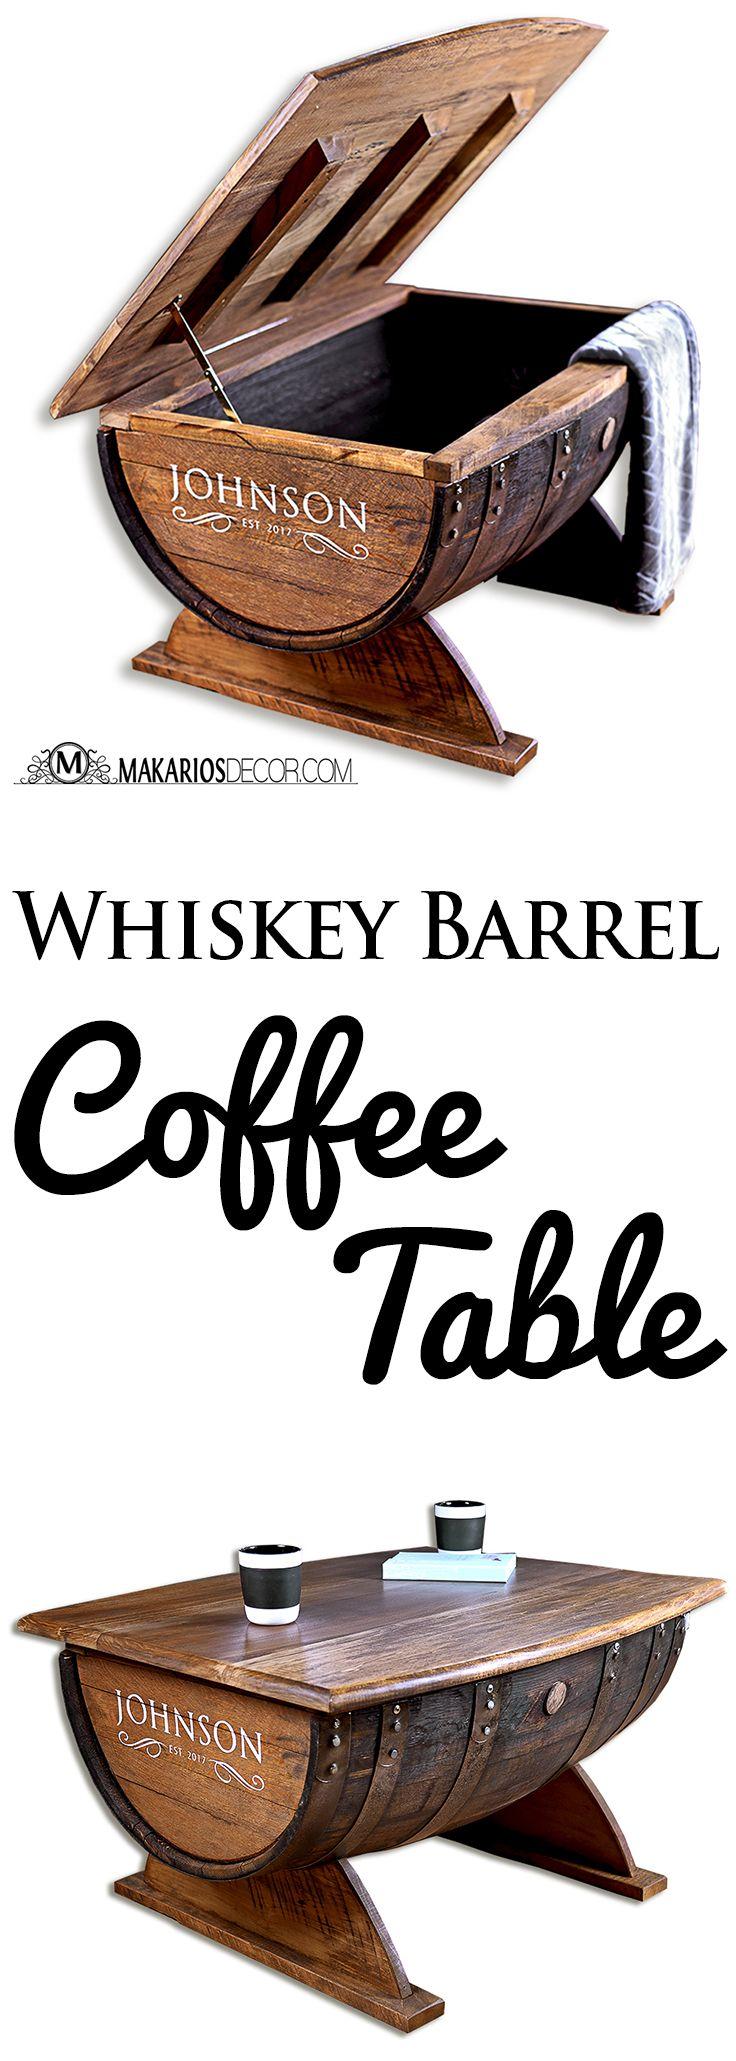 Wine Barrel Coffee Table, Coffee Table, Whiskey Barrel Coffee Table, Wine Barrel Table, Wine Barrel Furniture, Barrel Coffee Table, Barrel Table